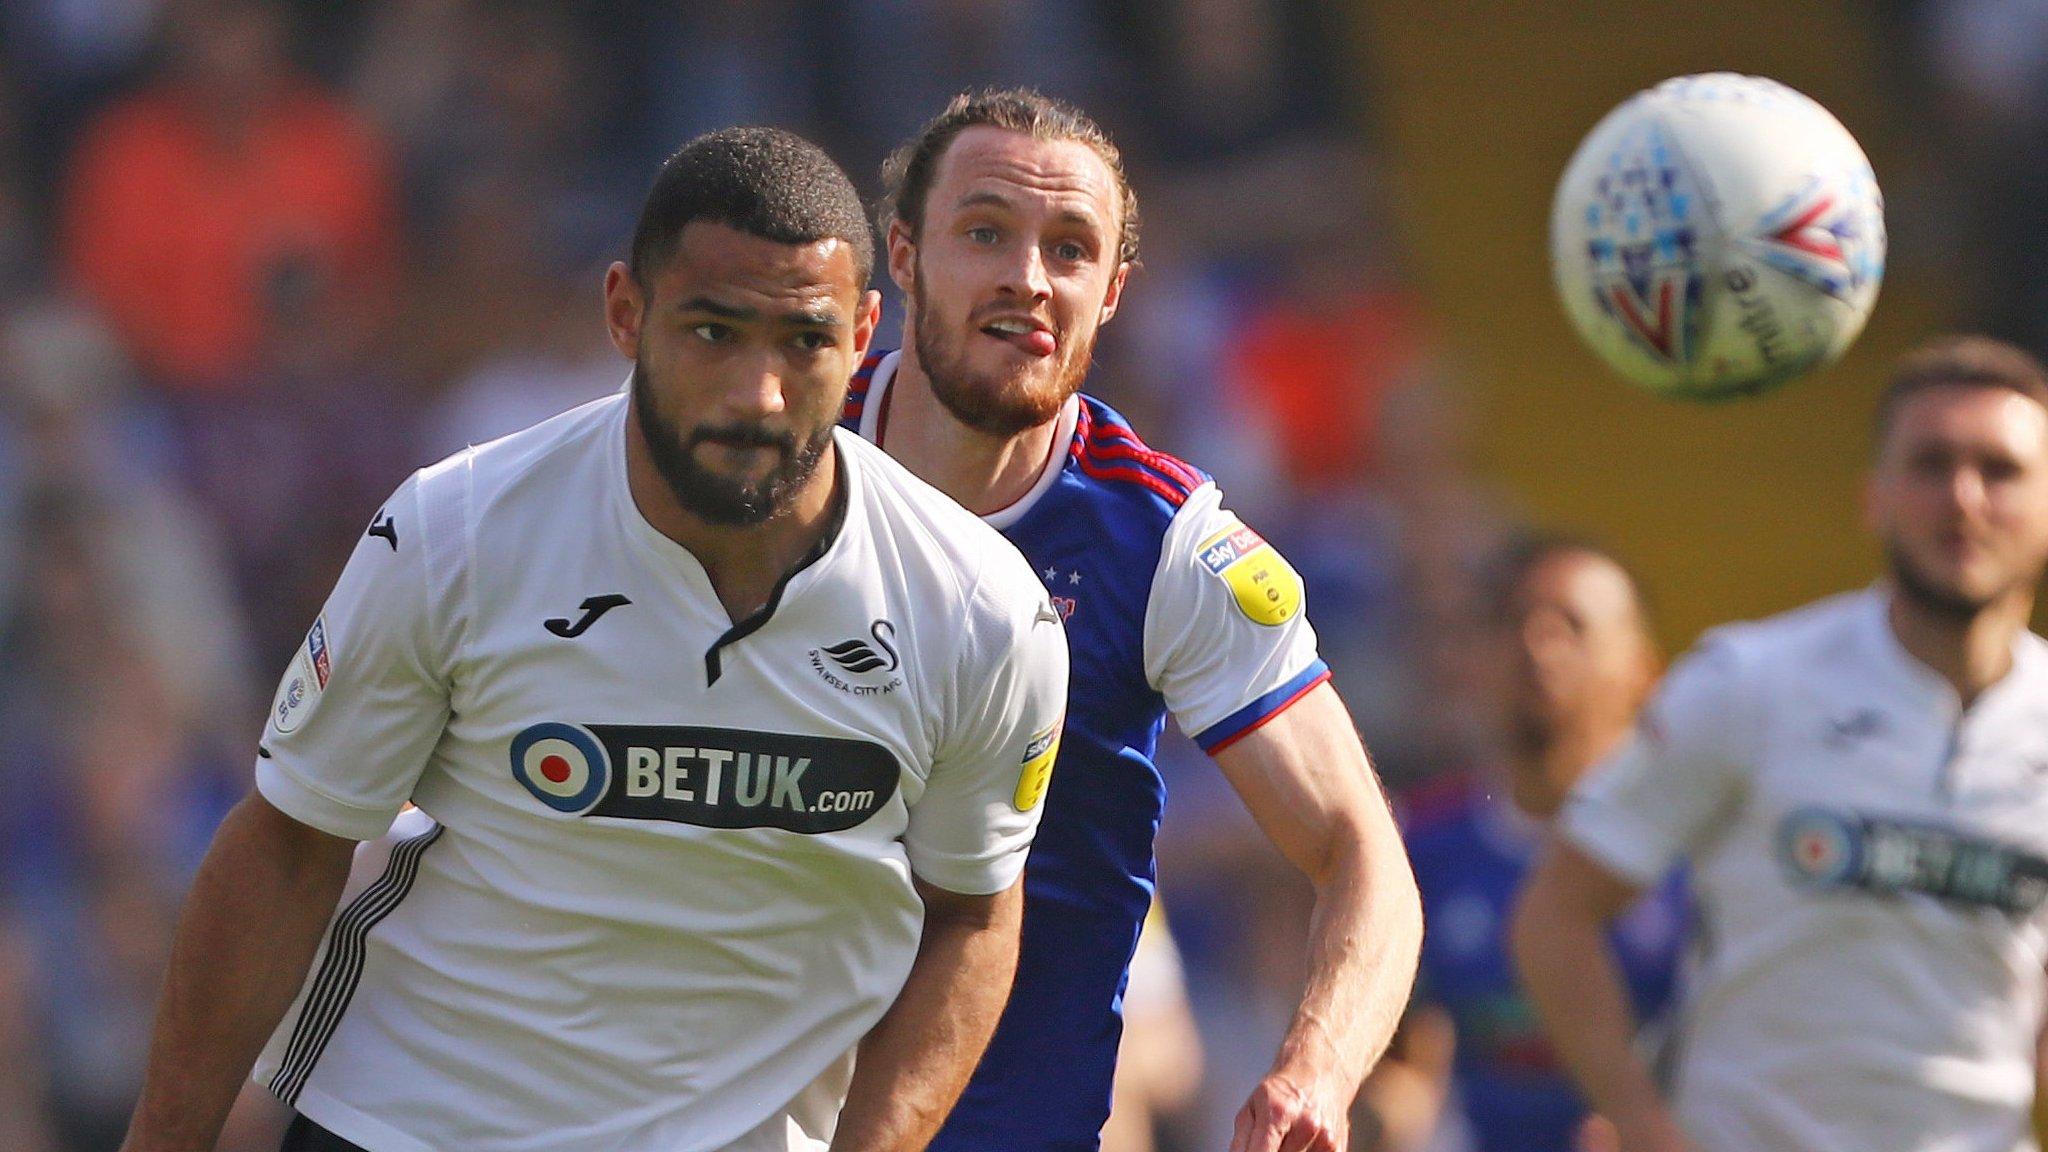 Ipswich Town 0-1 Swansea City: Swans halt losing away run